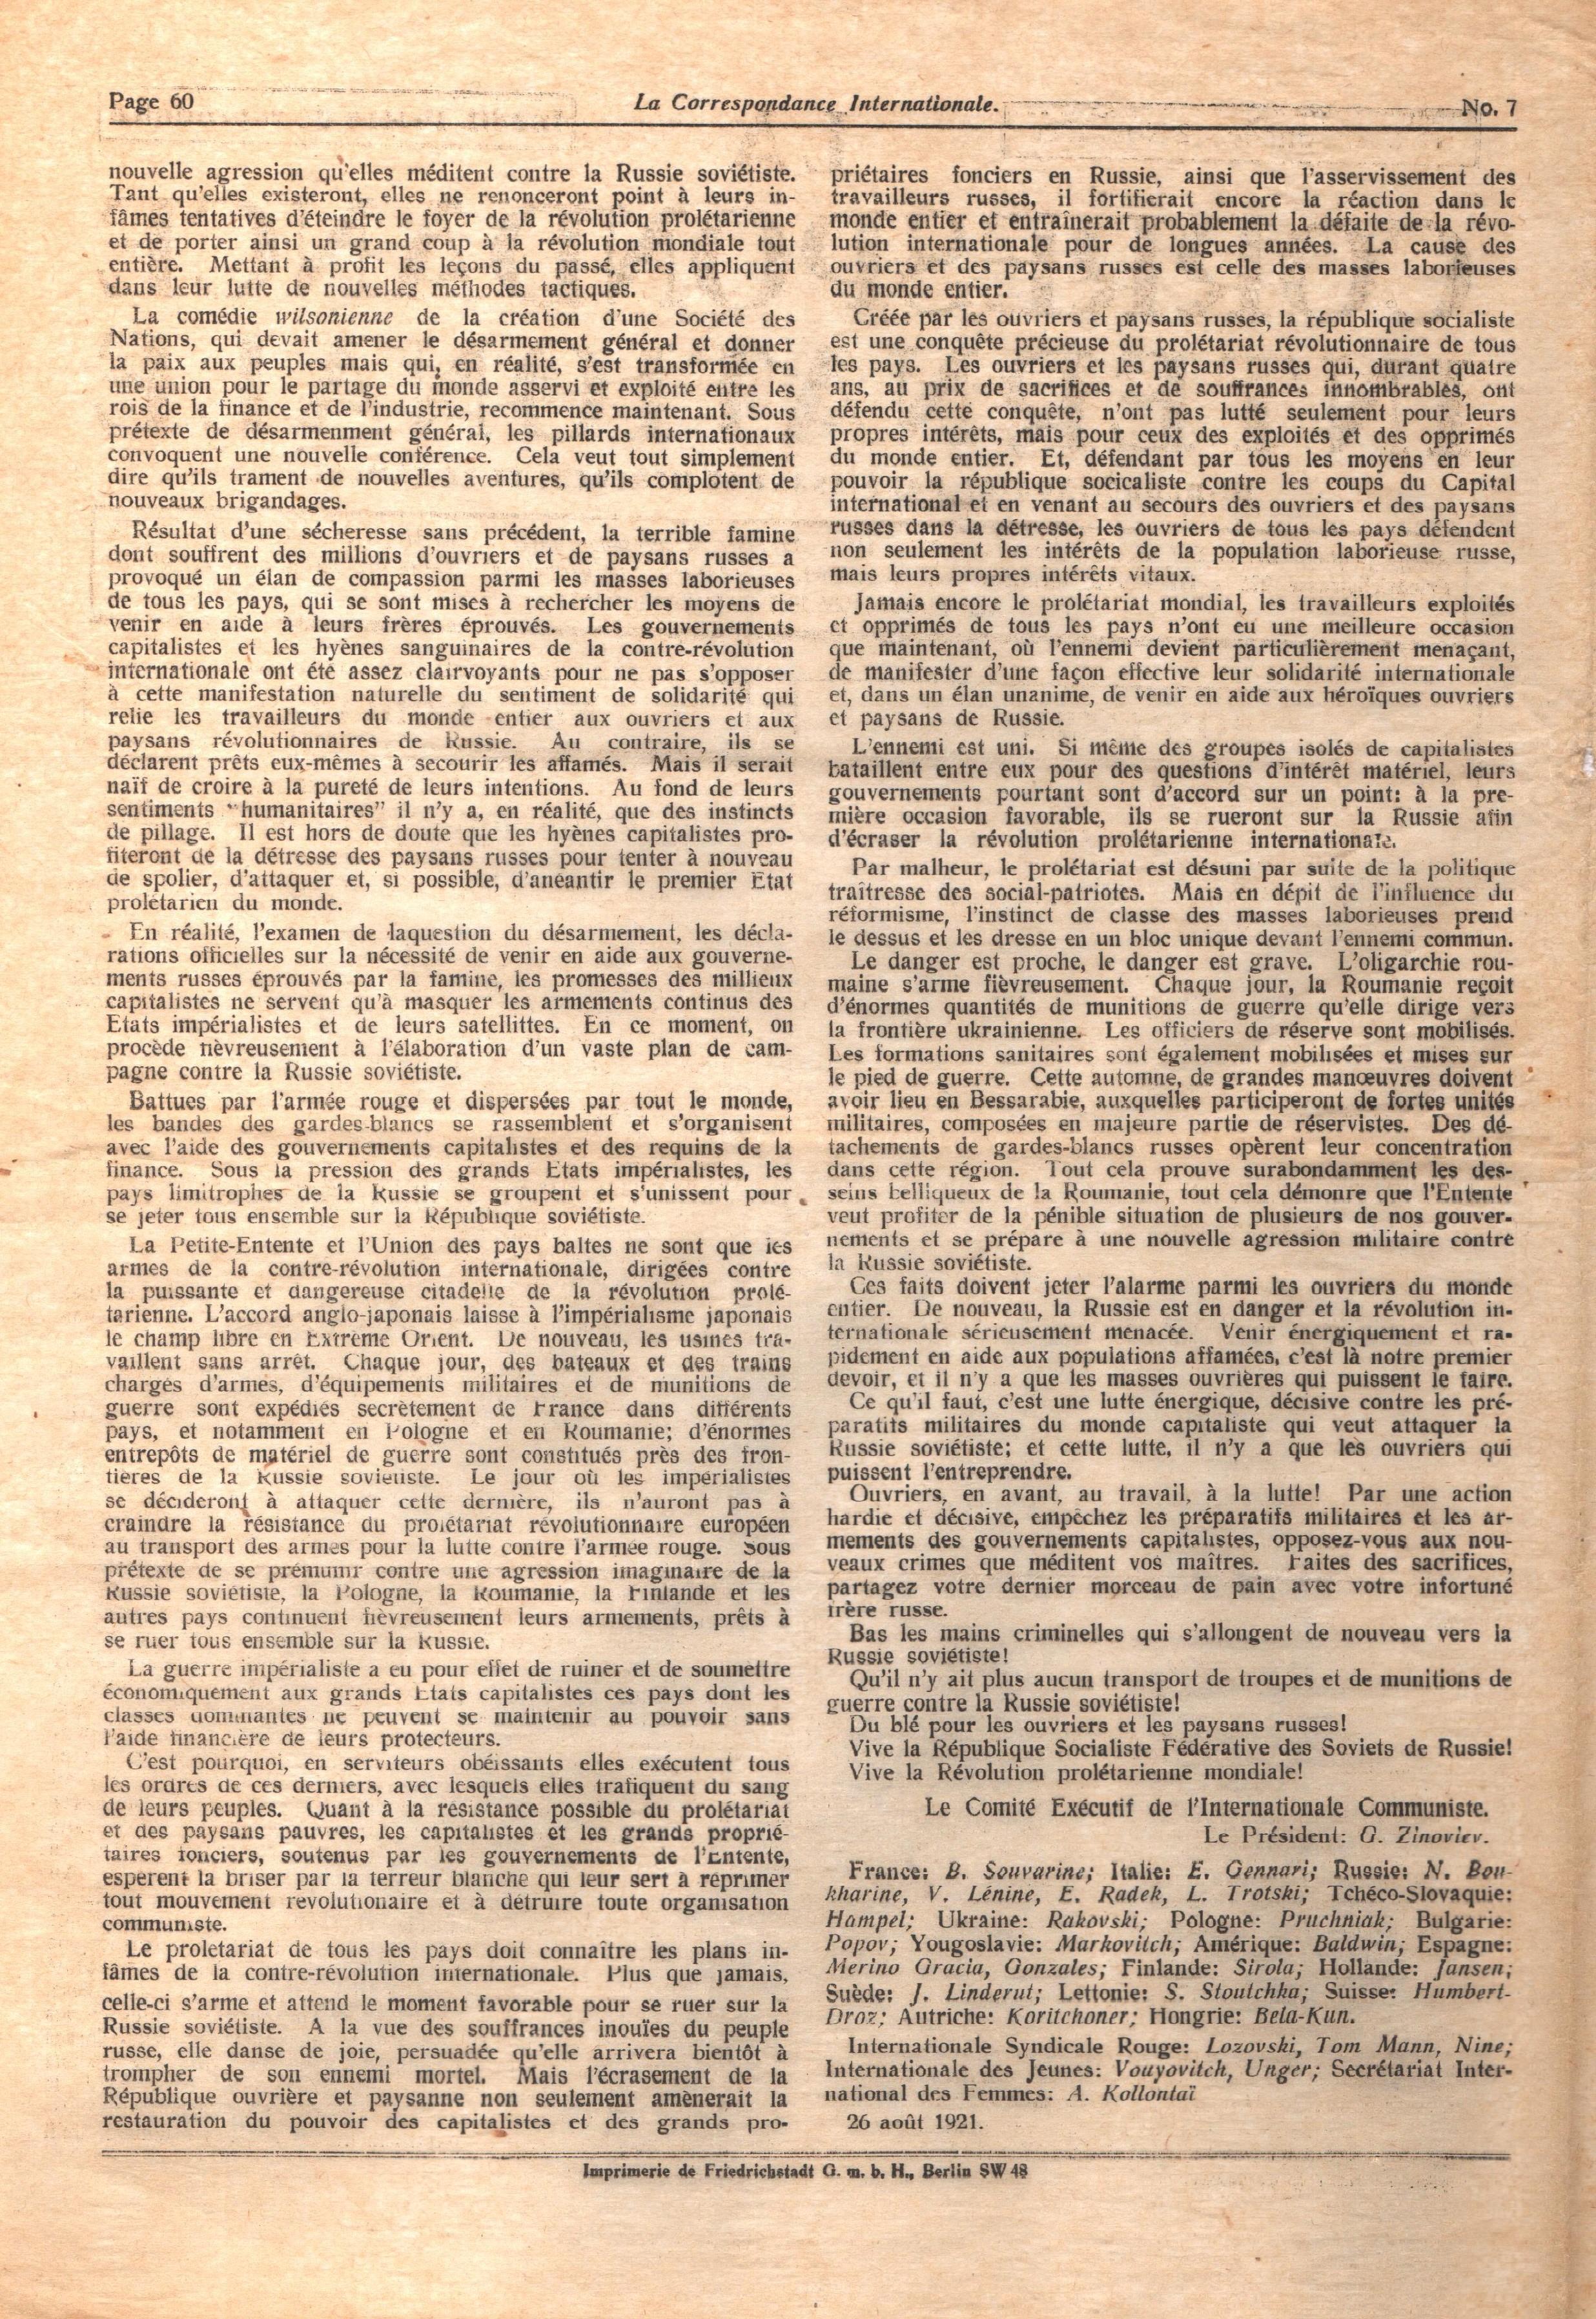 La Correspondance Internationale 7 - pag. 08